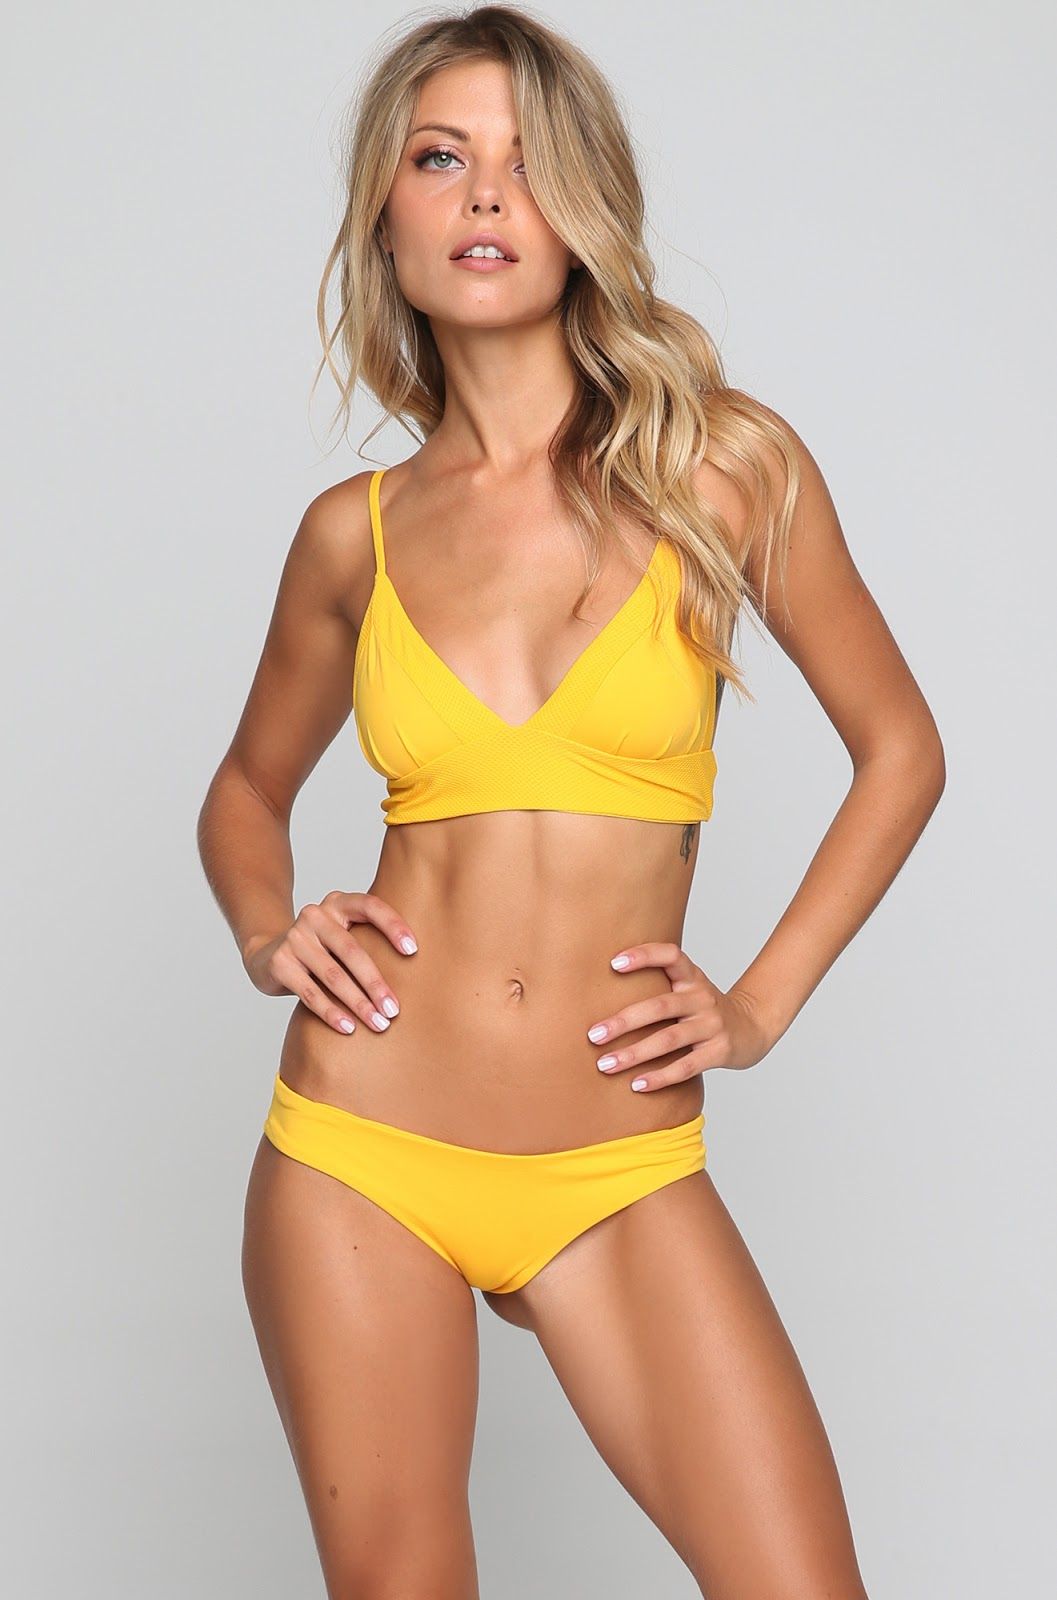 Bikini Olga Kobzar nudes (43 foto and video), Ass, Cleavage, Boobs, underwear 2015